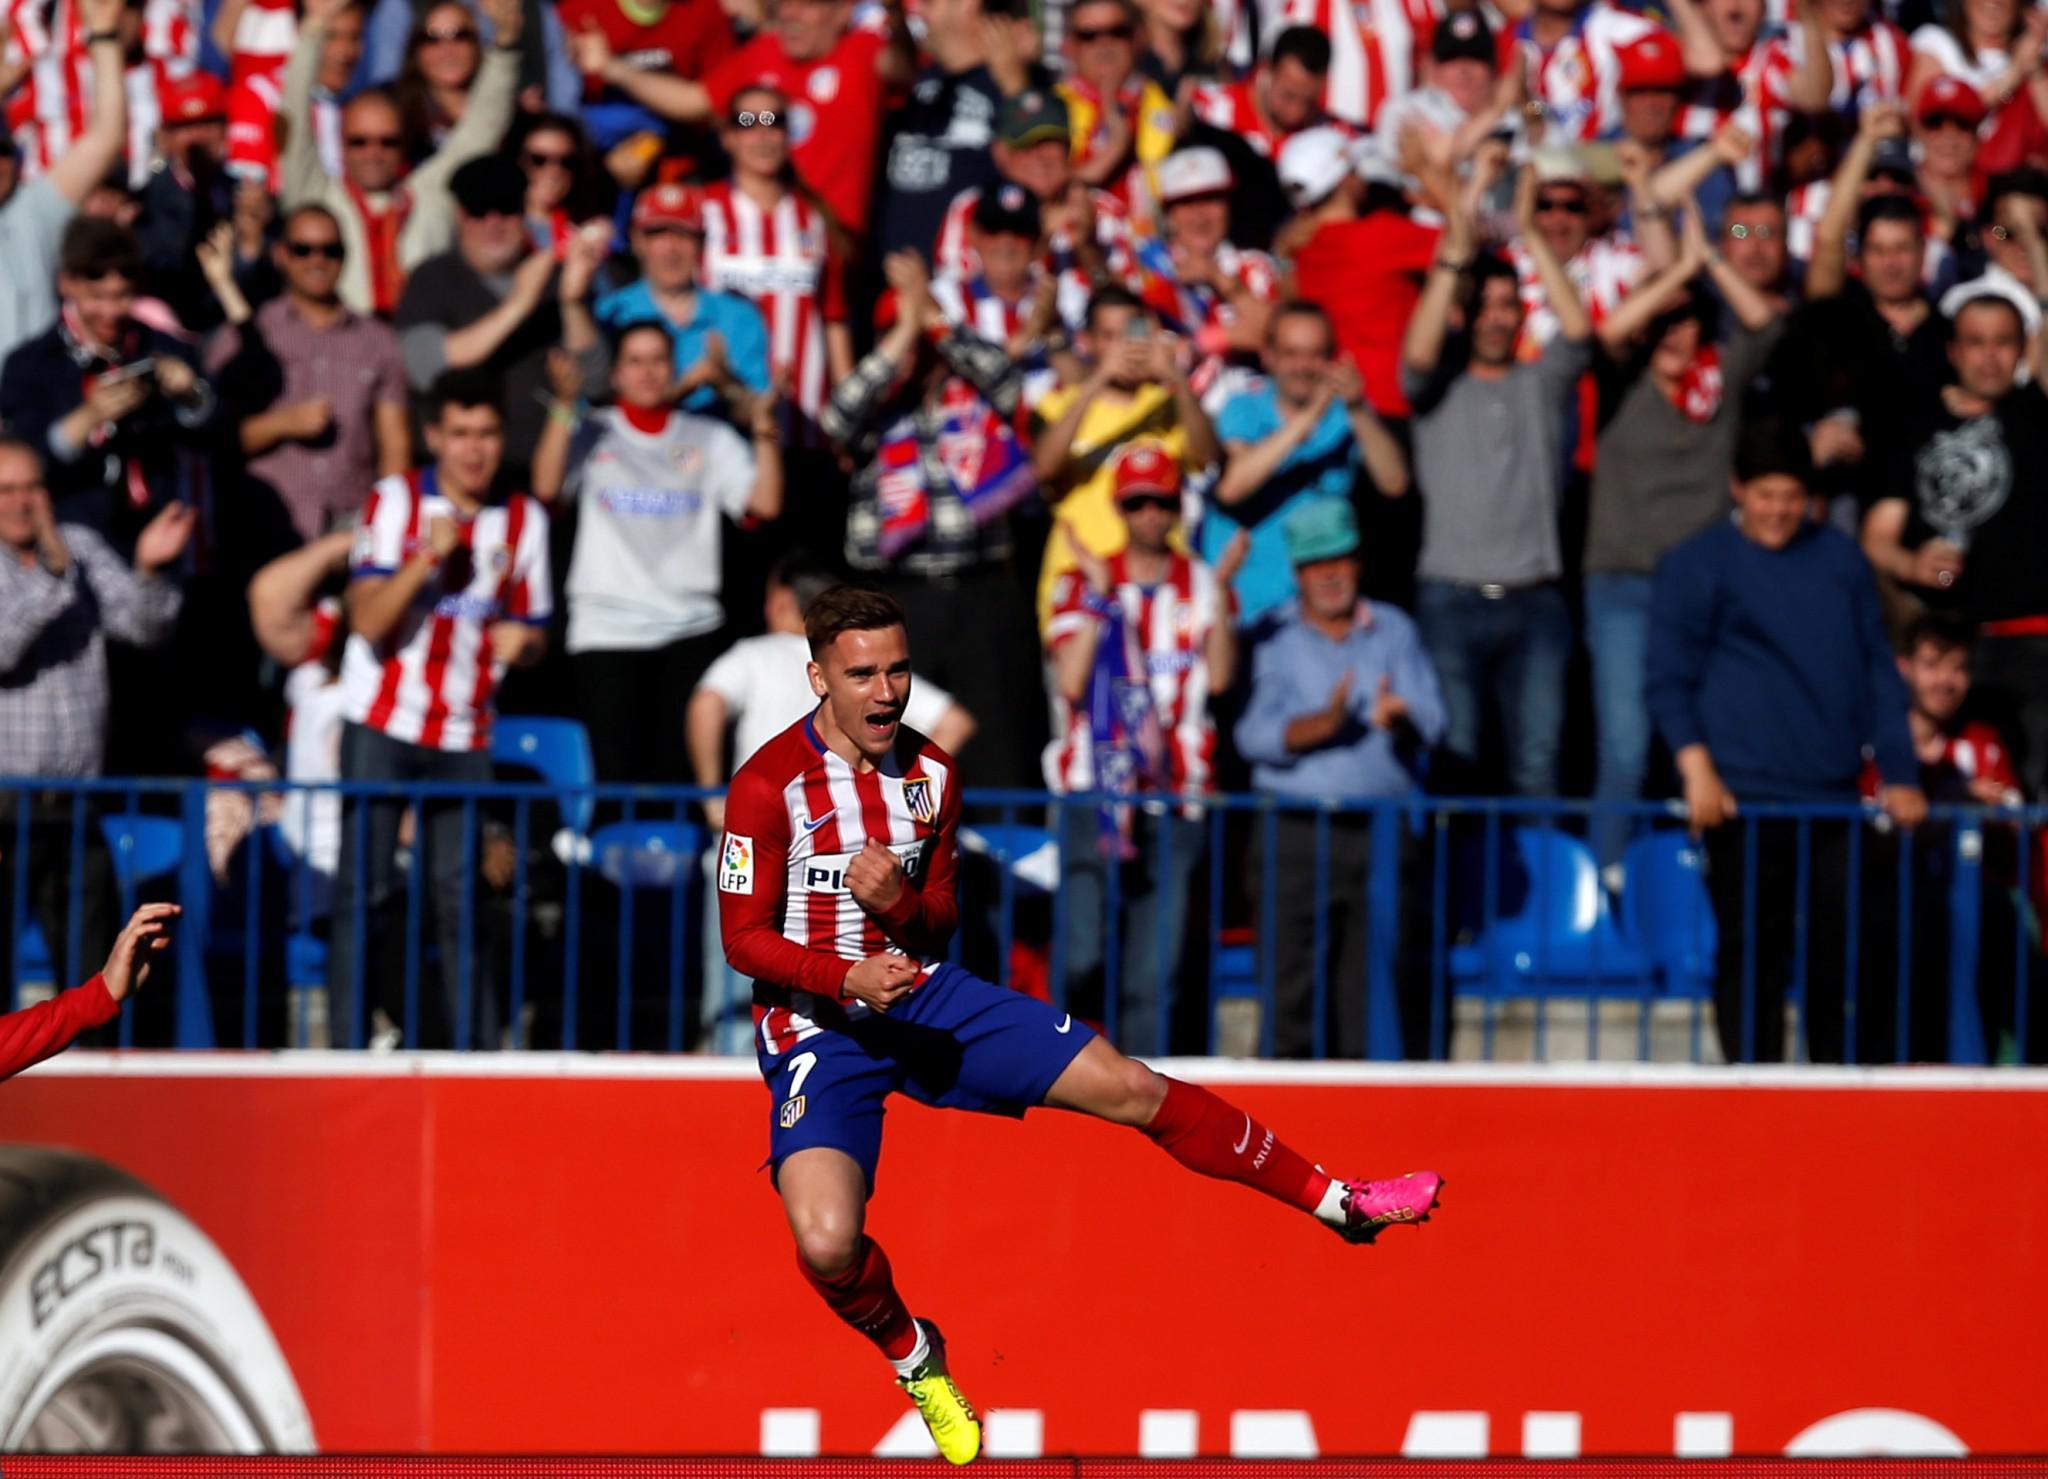 atletico-madrid-1000 Η μάχη στην κορυφή της Primera Division καλά κρατεί